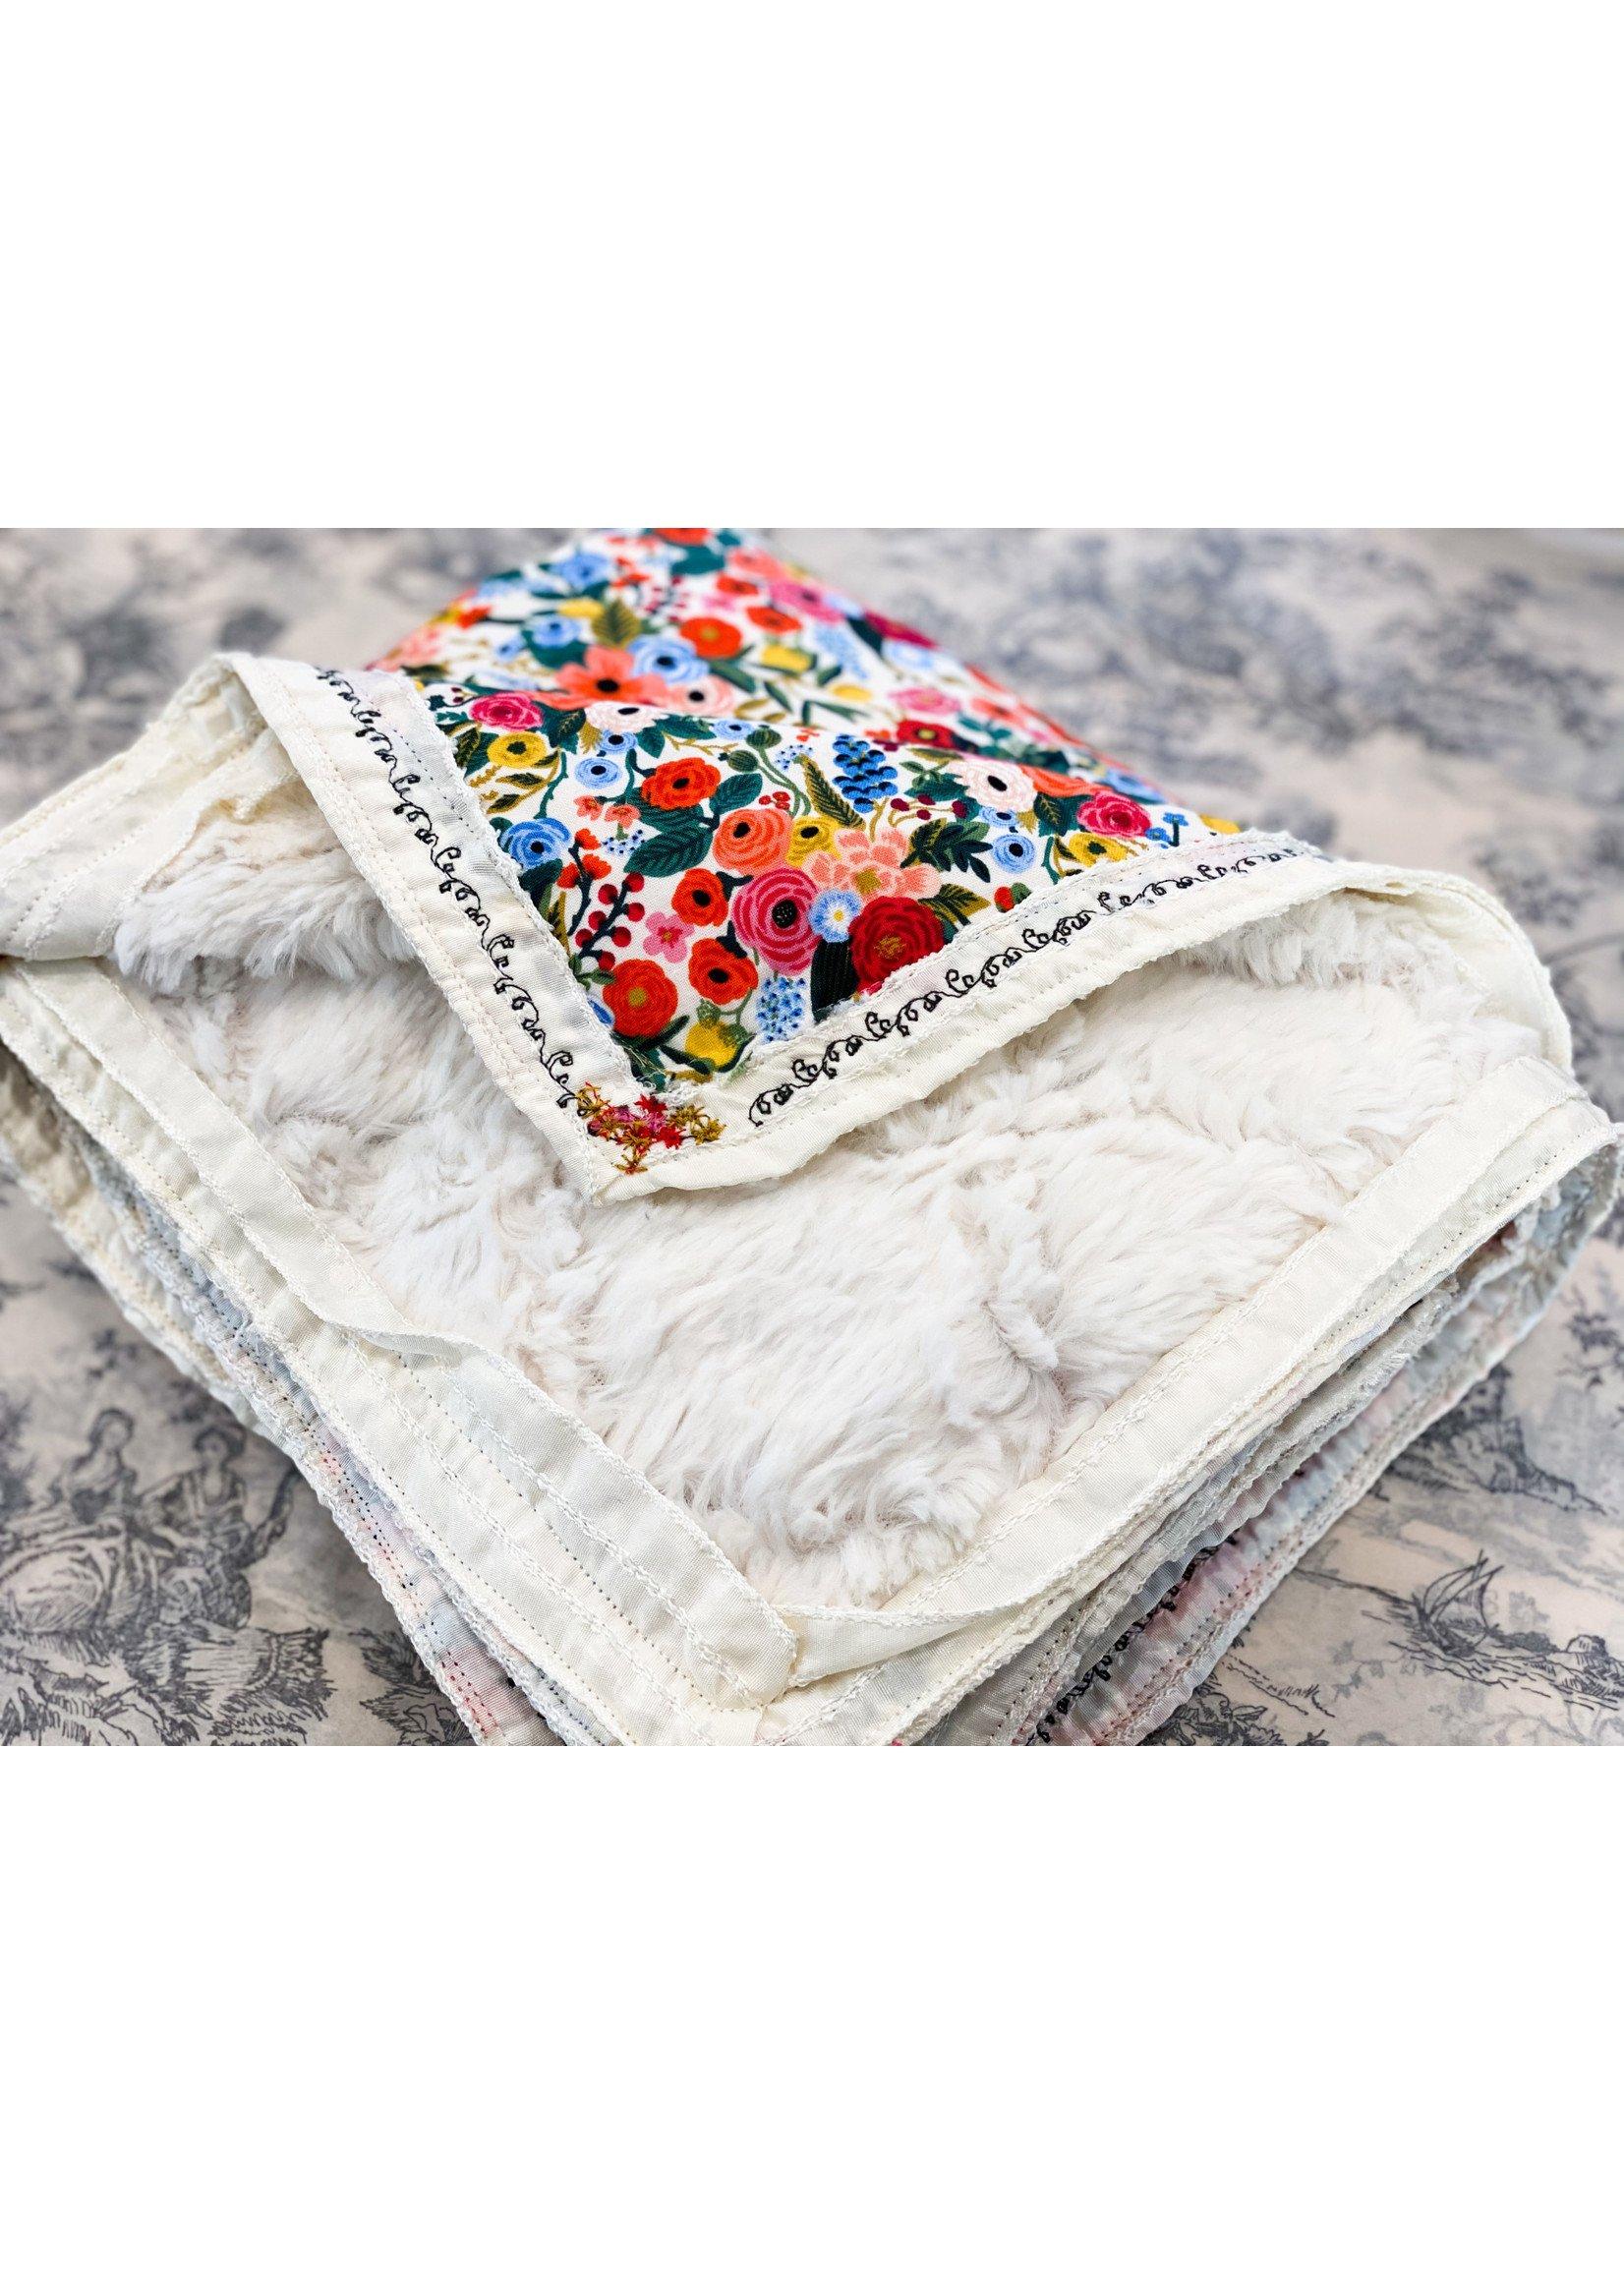 Baby Blanket - Locally Handmade Jewel Tone - Embroidered Edge